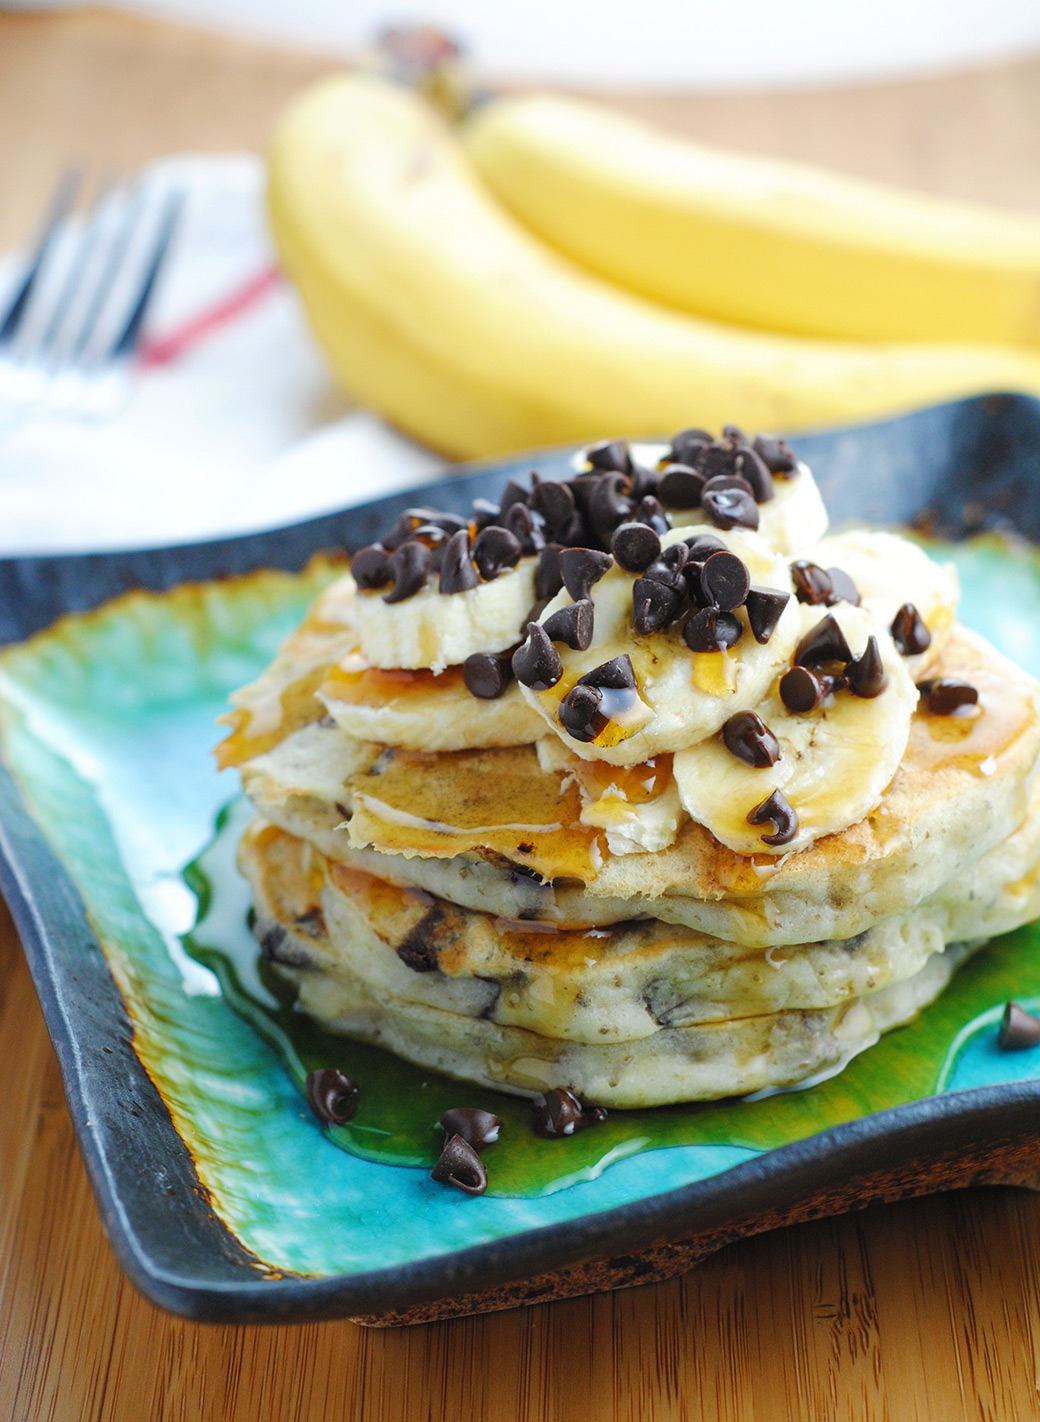 Banana Chocolate Chip Vegan Pancakes (Vegan, Dairy-free) by The Blenderist